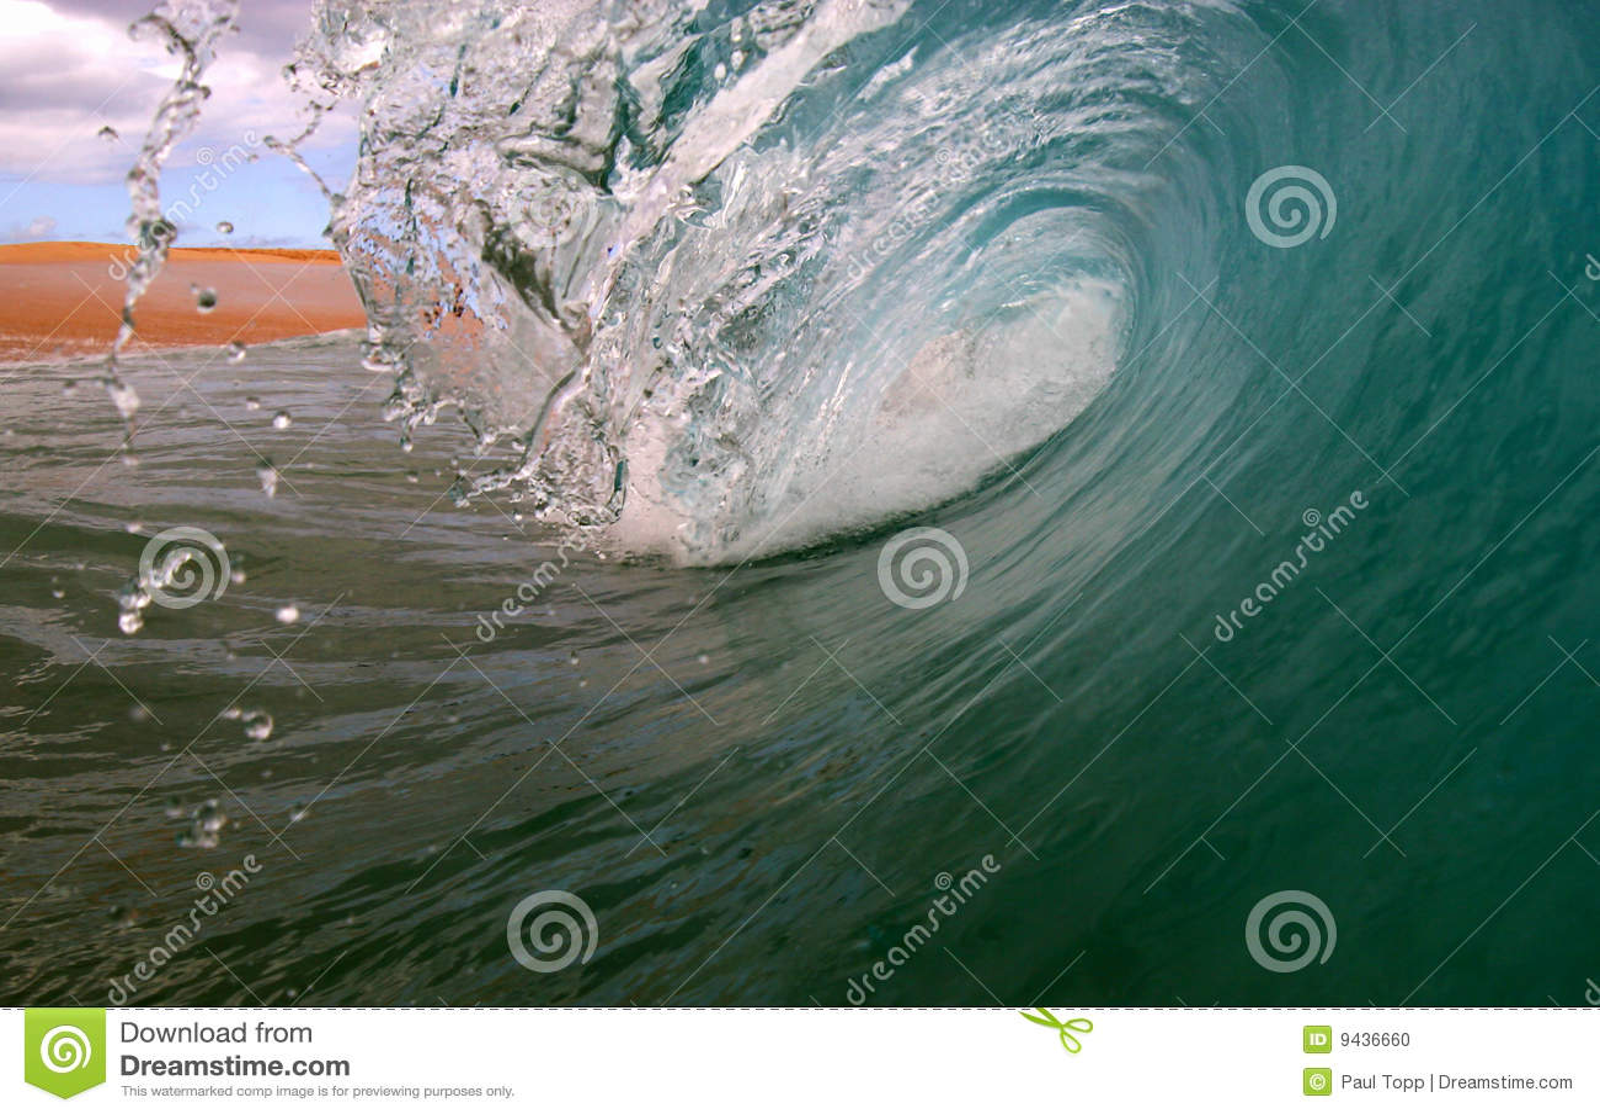 Ozean-Brandung-Welle